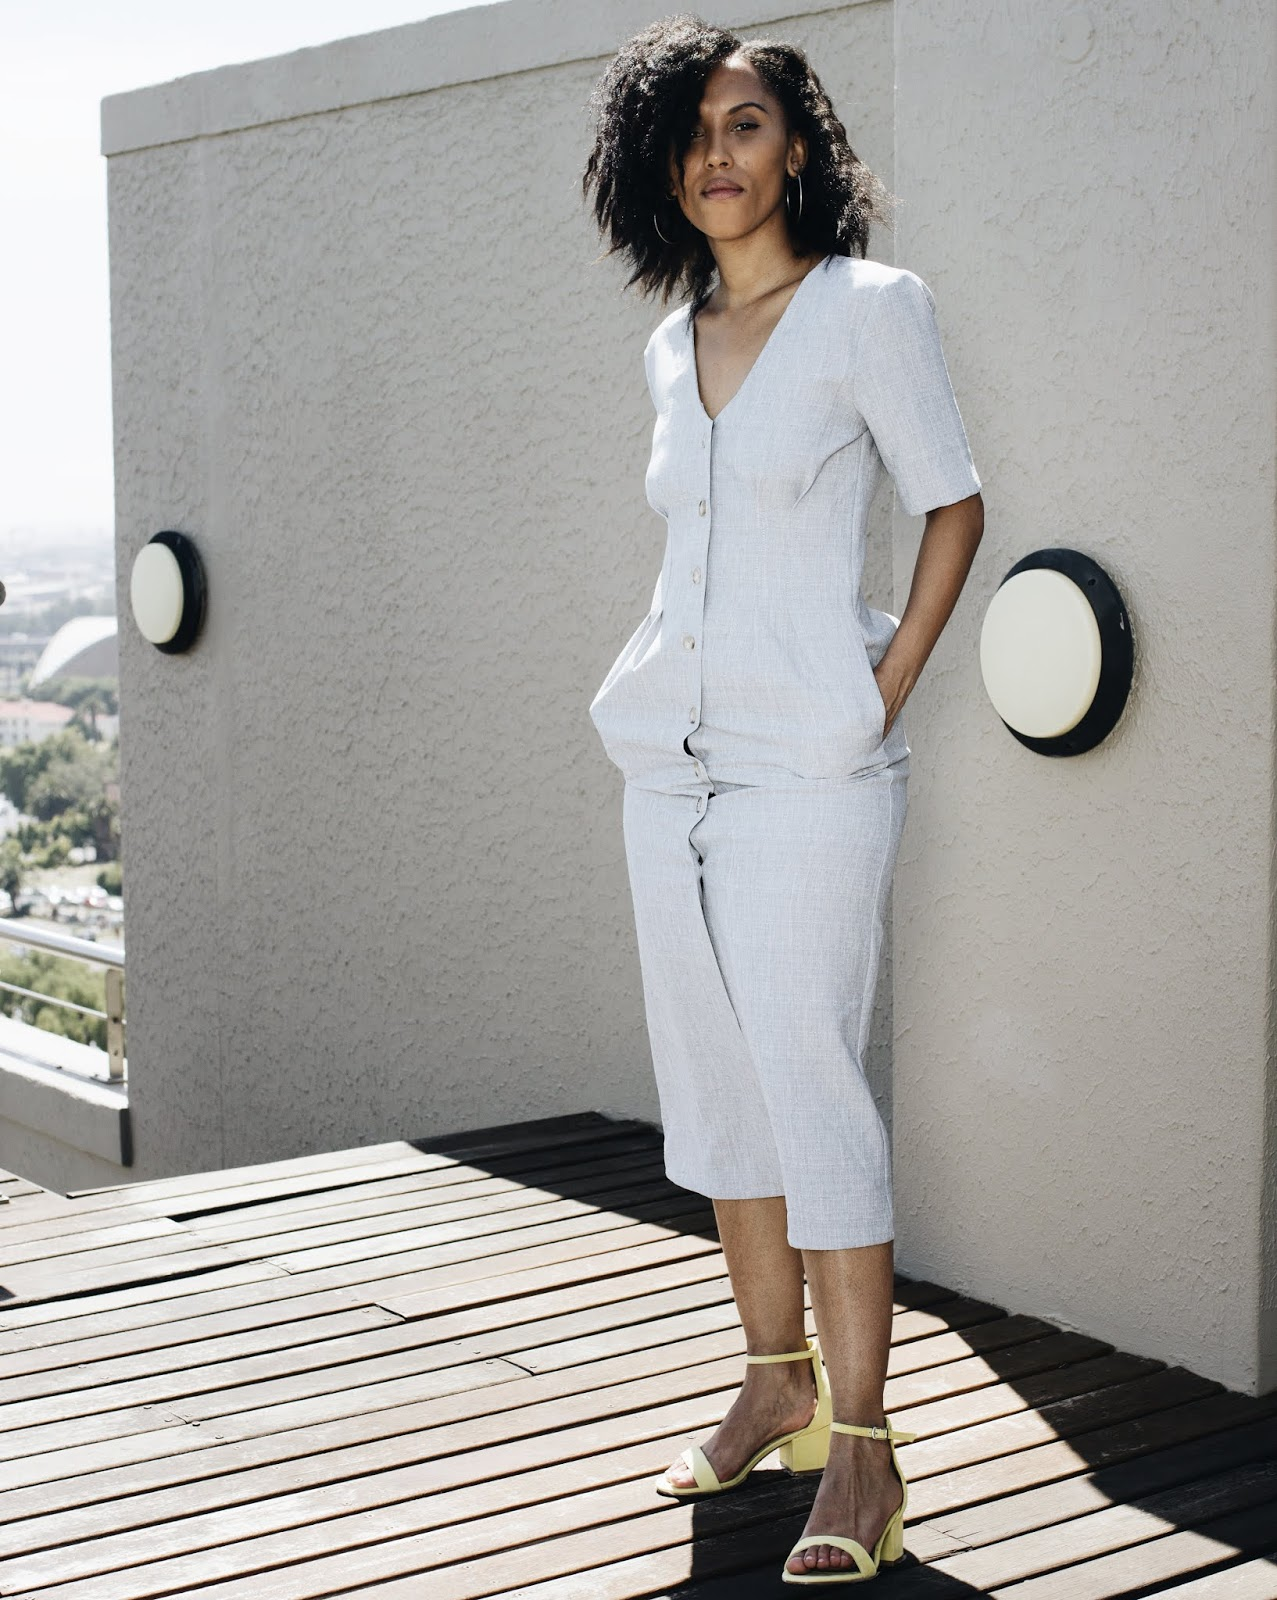 Liezel-Esquire-fashion-blogger-buttoned-down-linen-dress